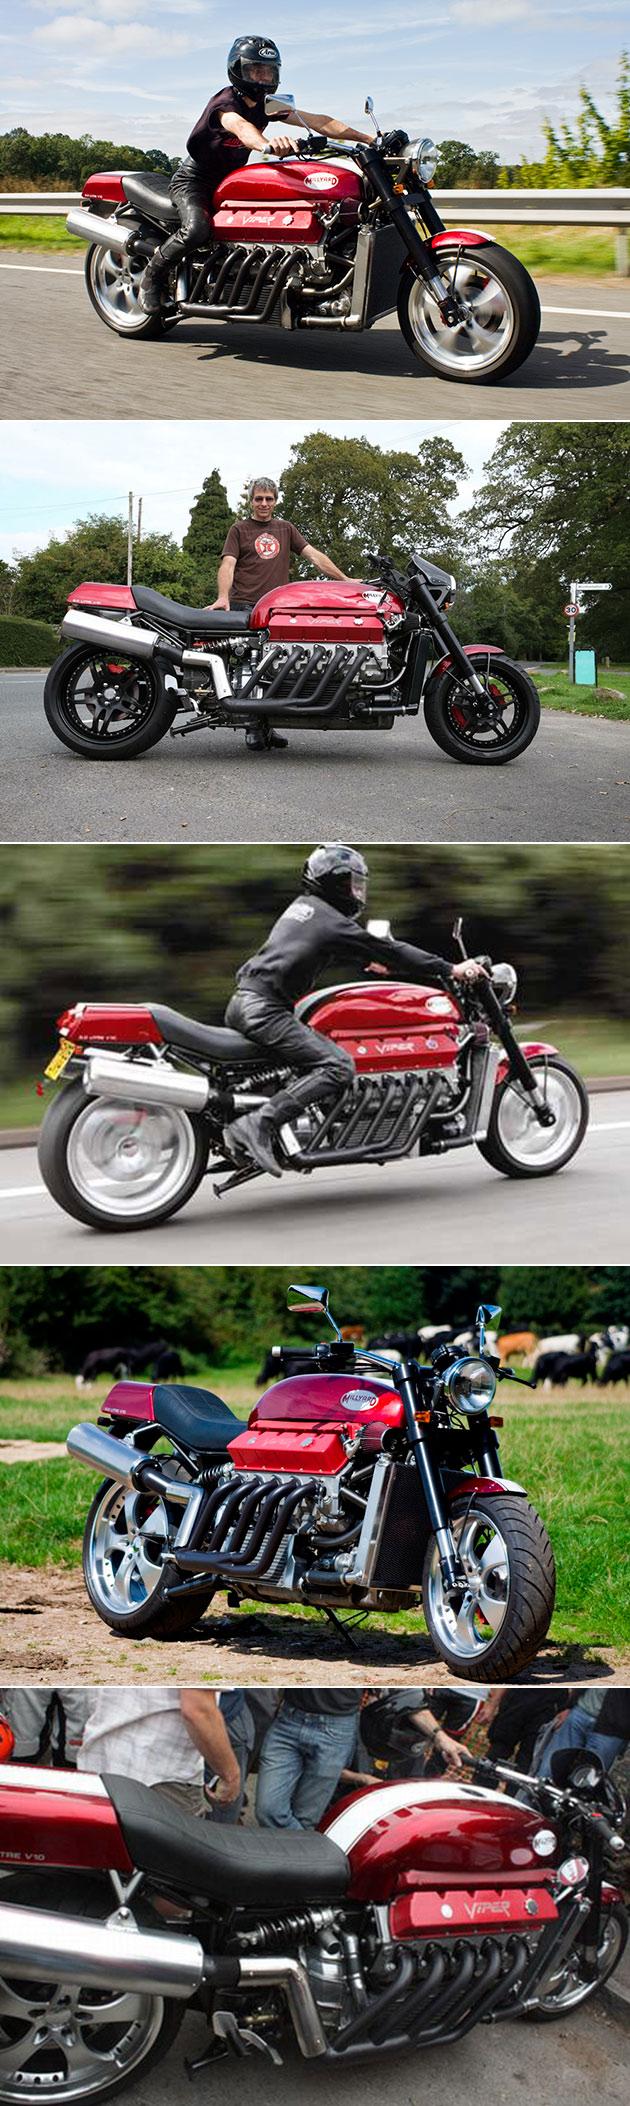 Millyard Viper V10 Motorcycle